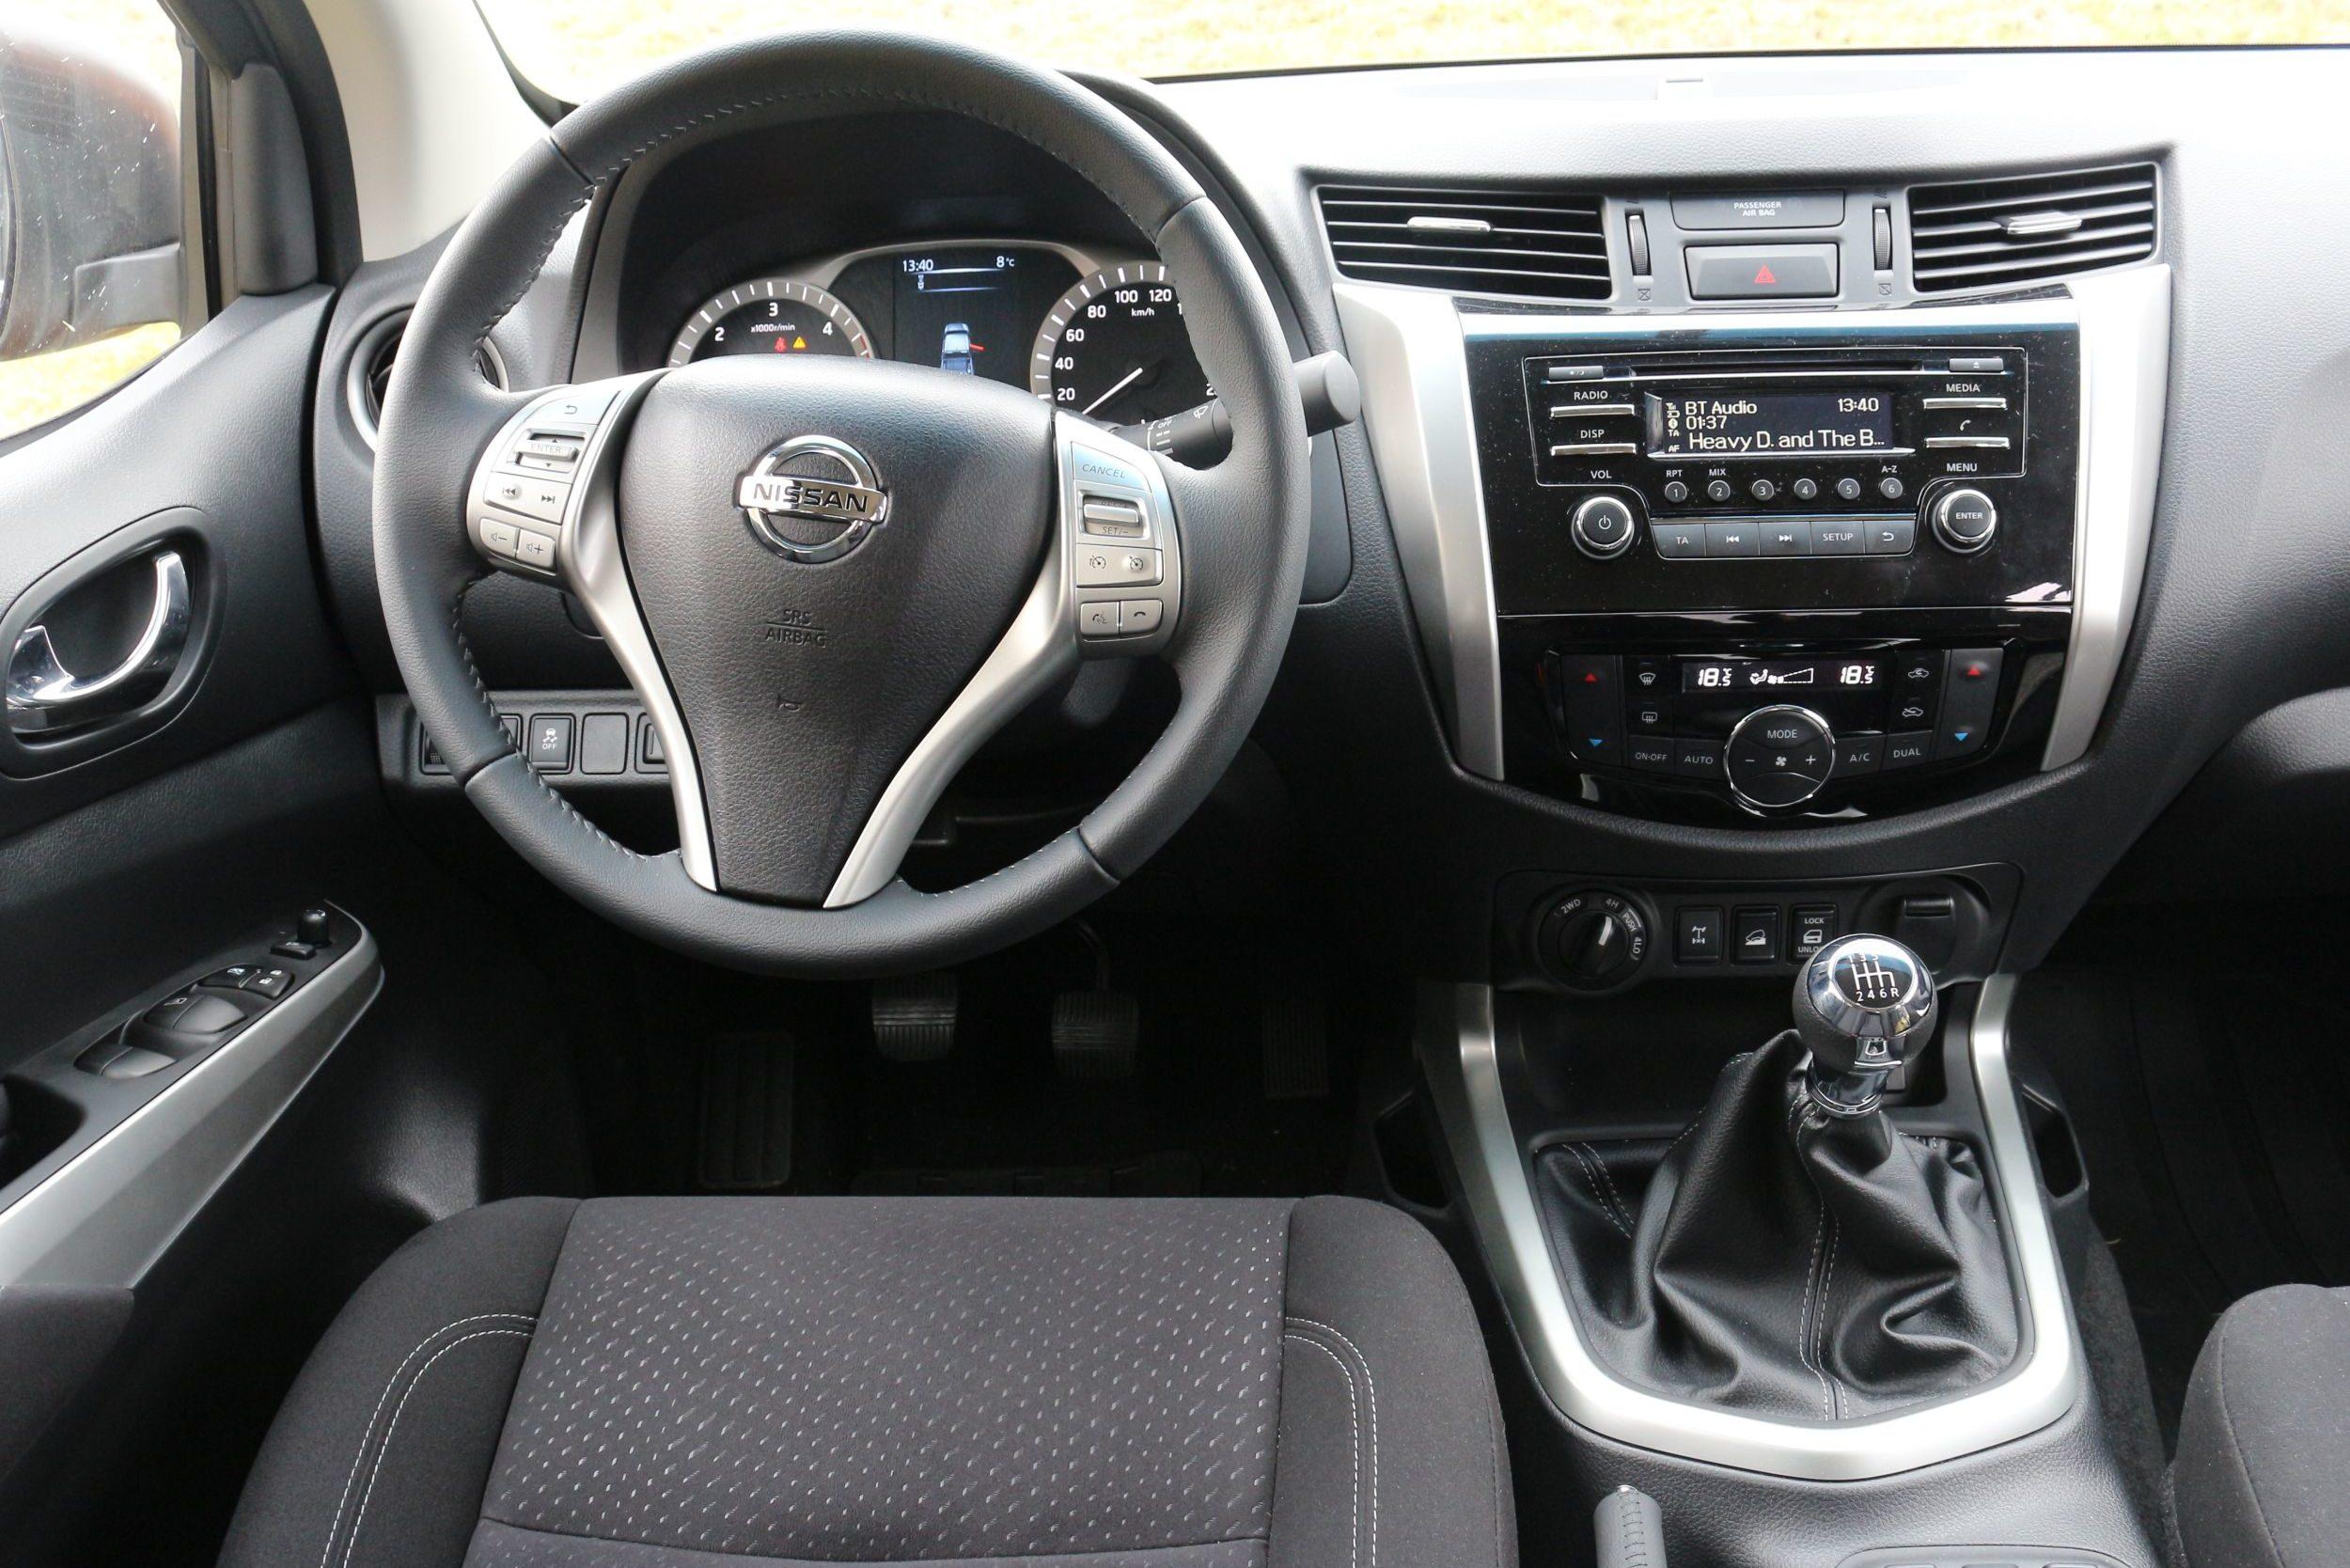 Nissan Navara belső